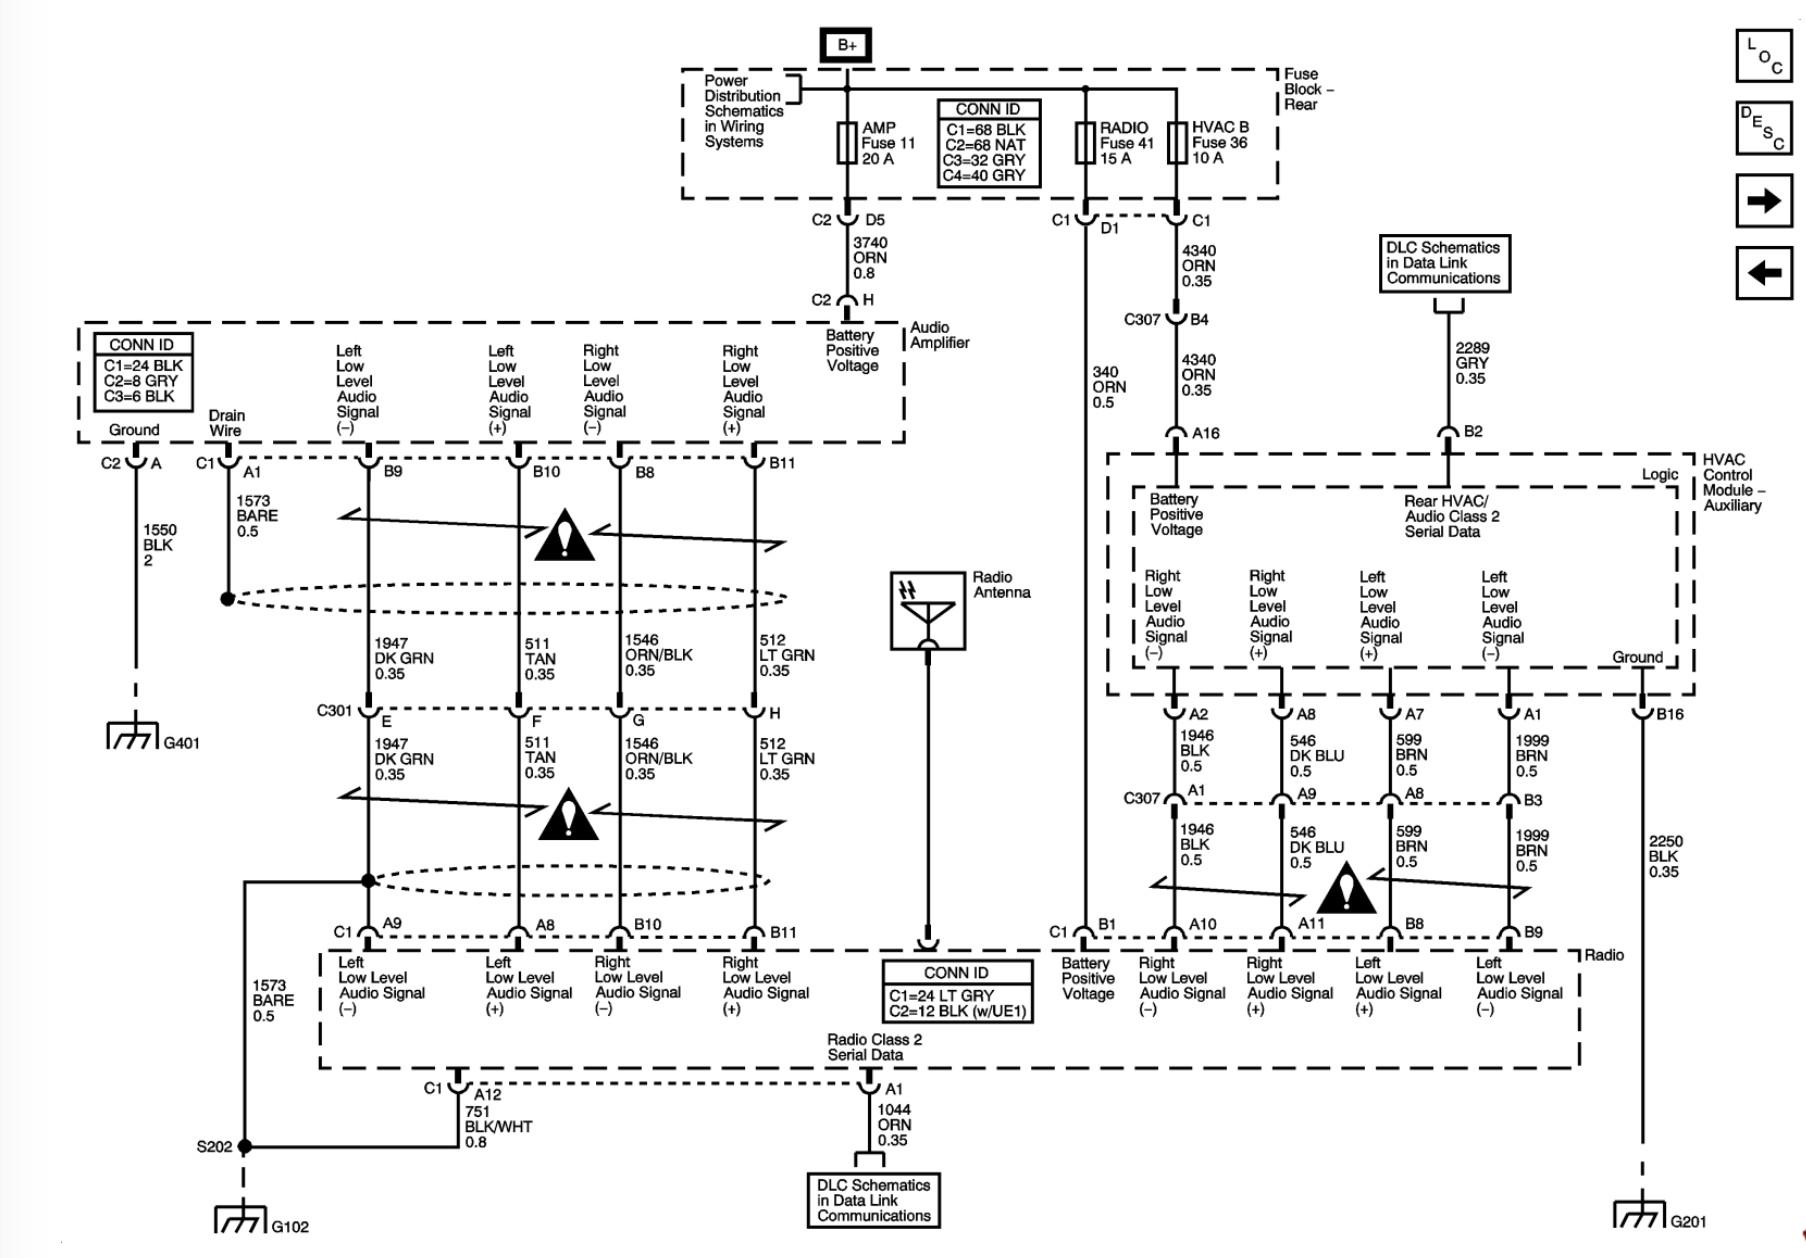 2004 Gmc Enbvoy Xuv Rear Tailgate Electrical Wiring Diagram Diagram] 2004 Gmc Envoy Radio Wiring Diagram Full Version Hd